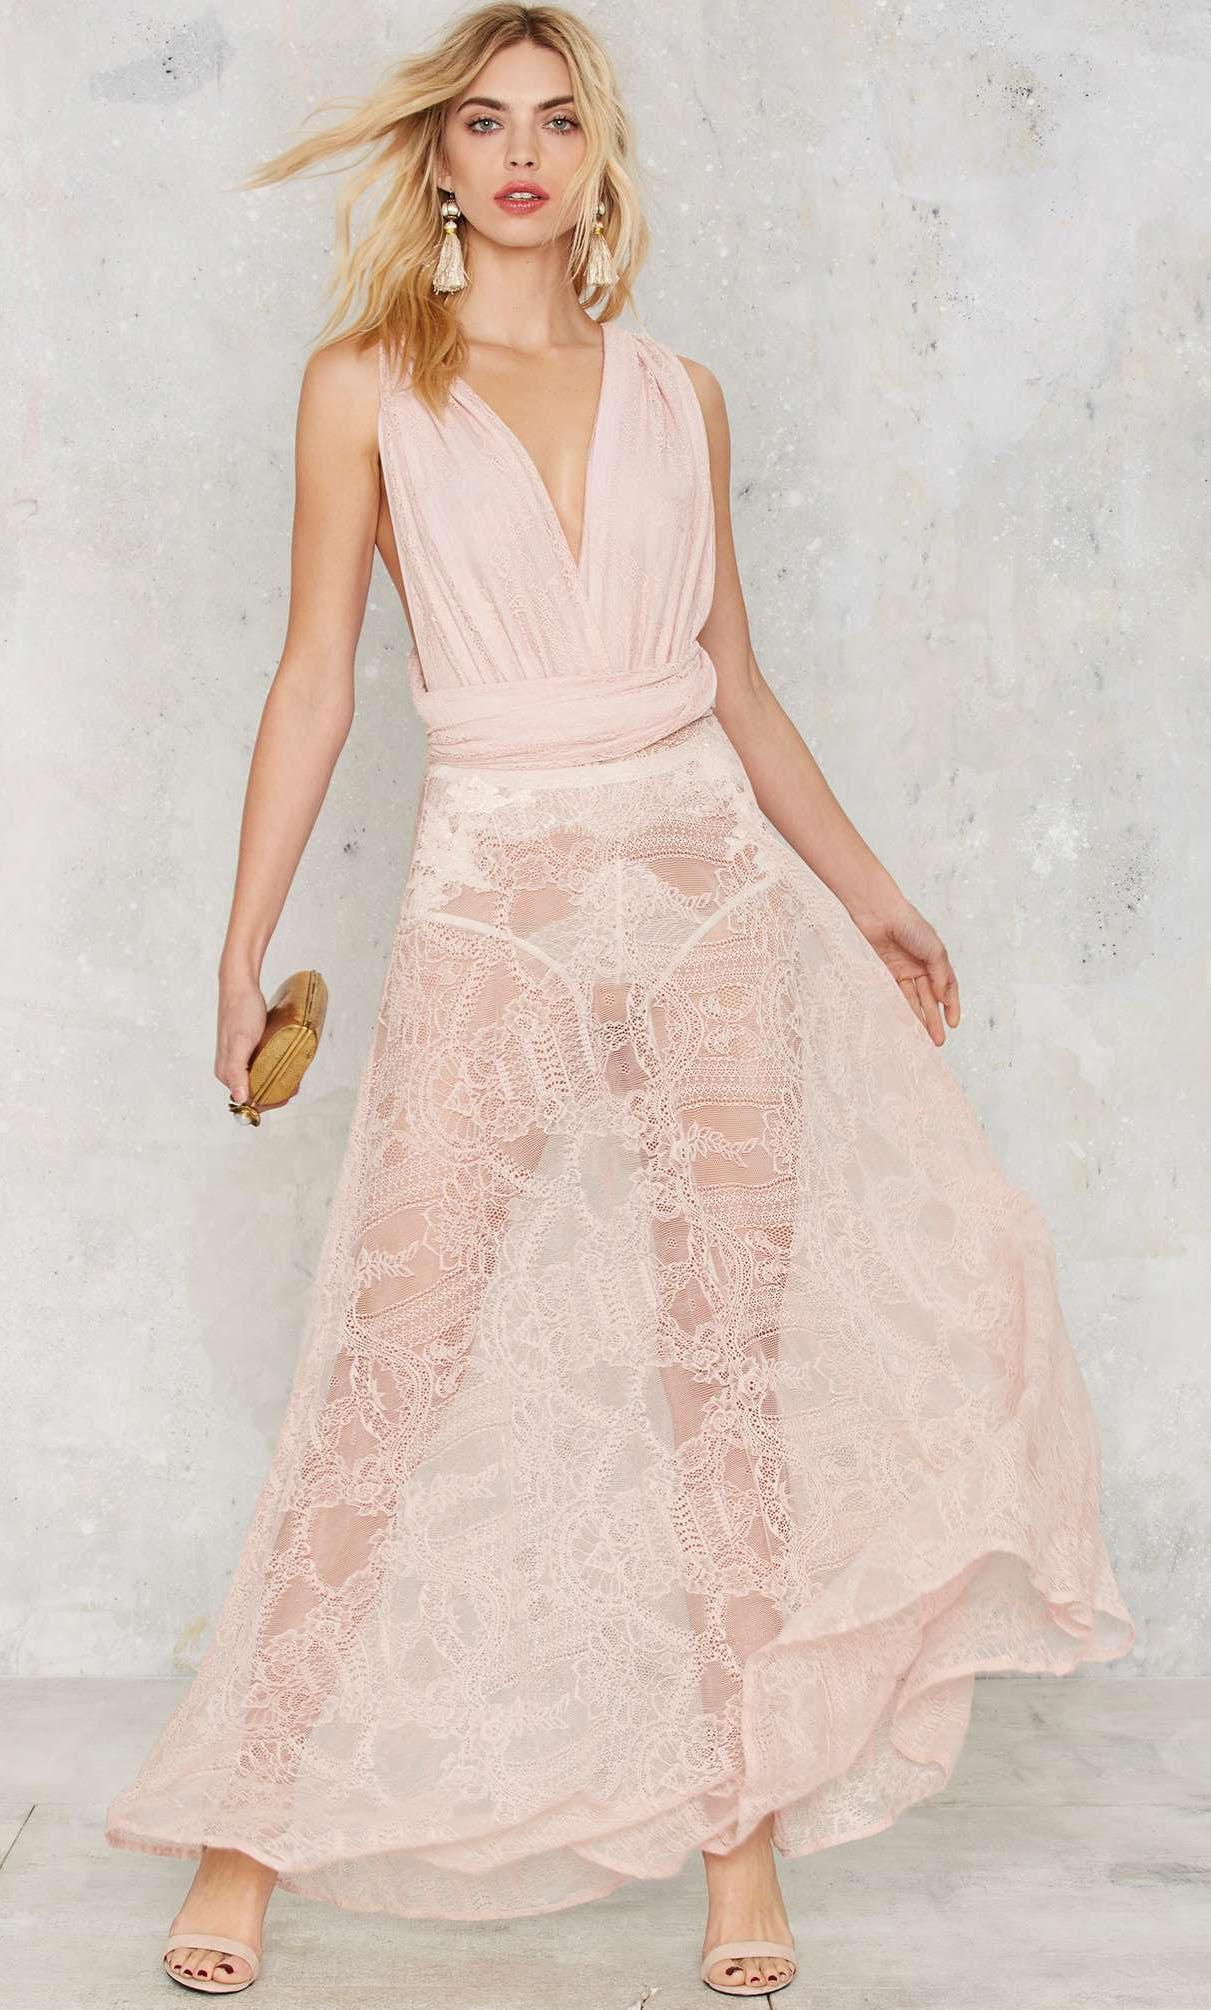 pink-light-dress-maxi-sheer-blonde-earrings-spring-summer-dinner.jpeg